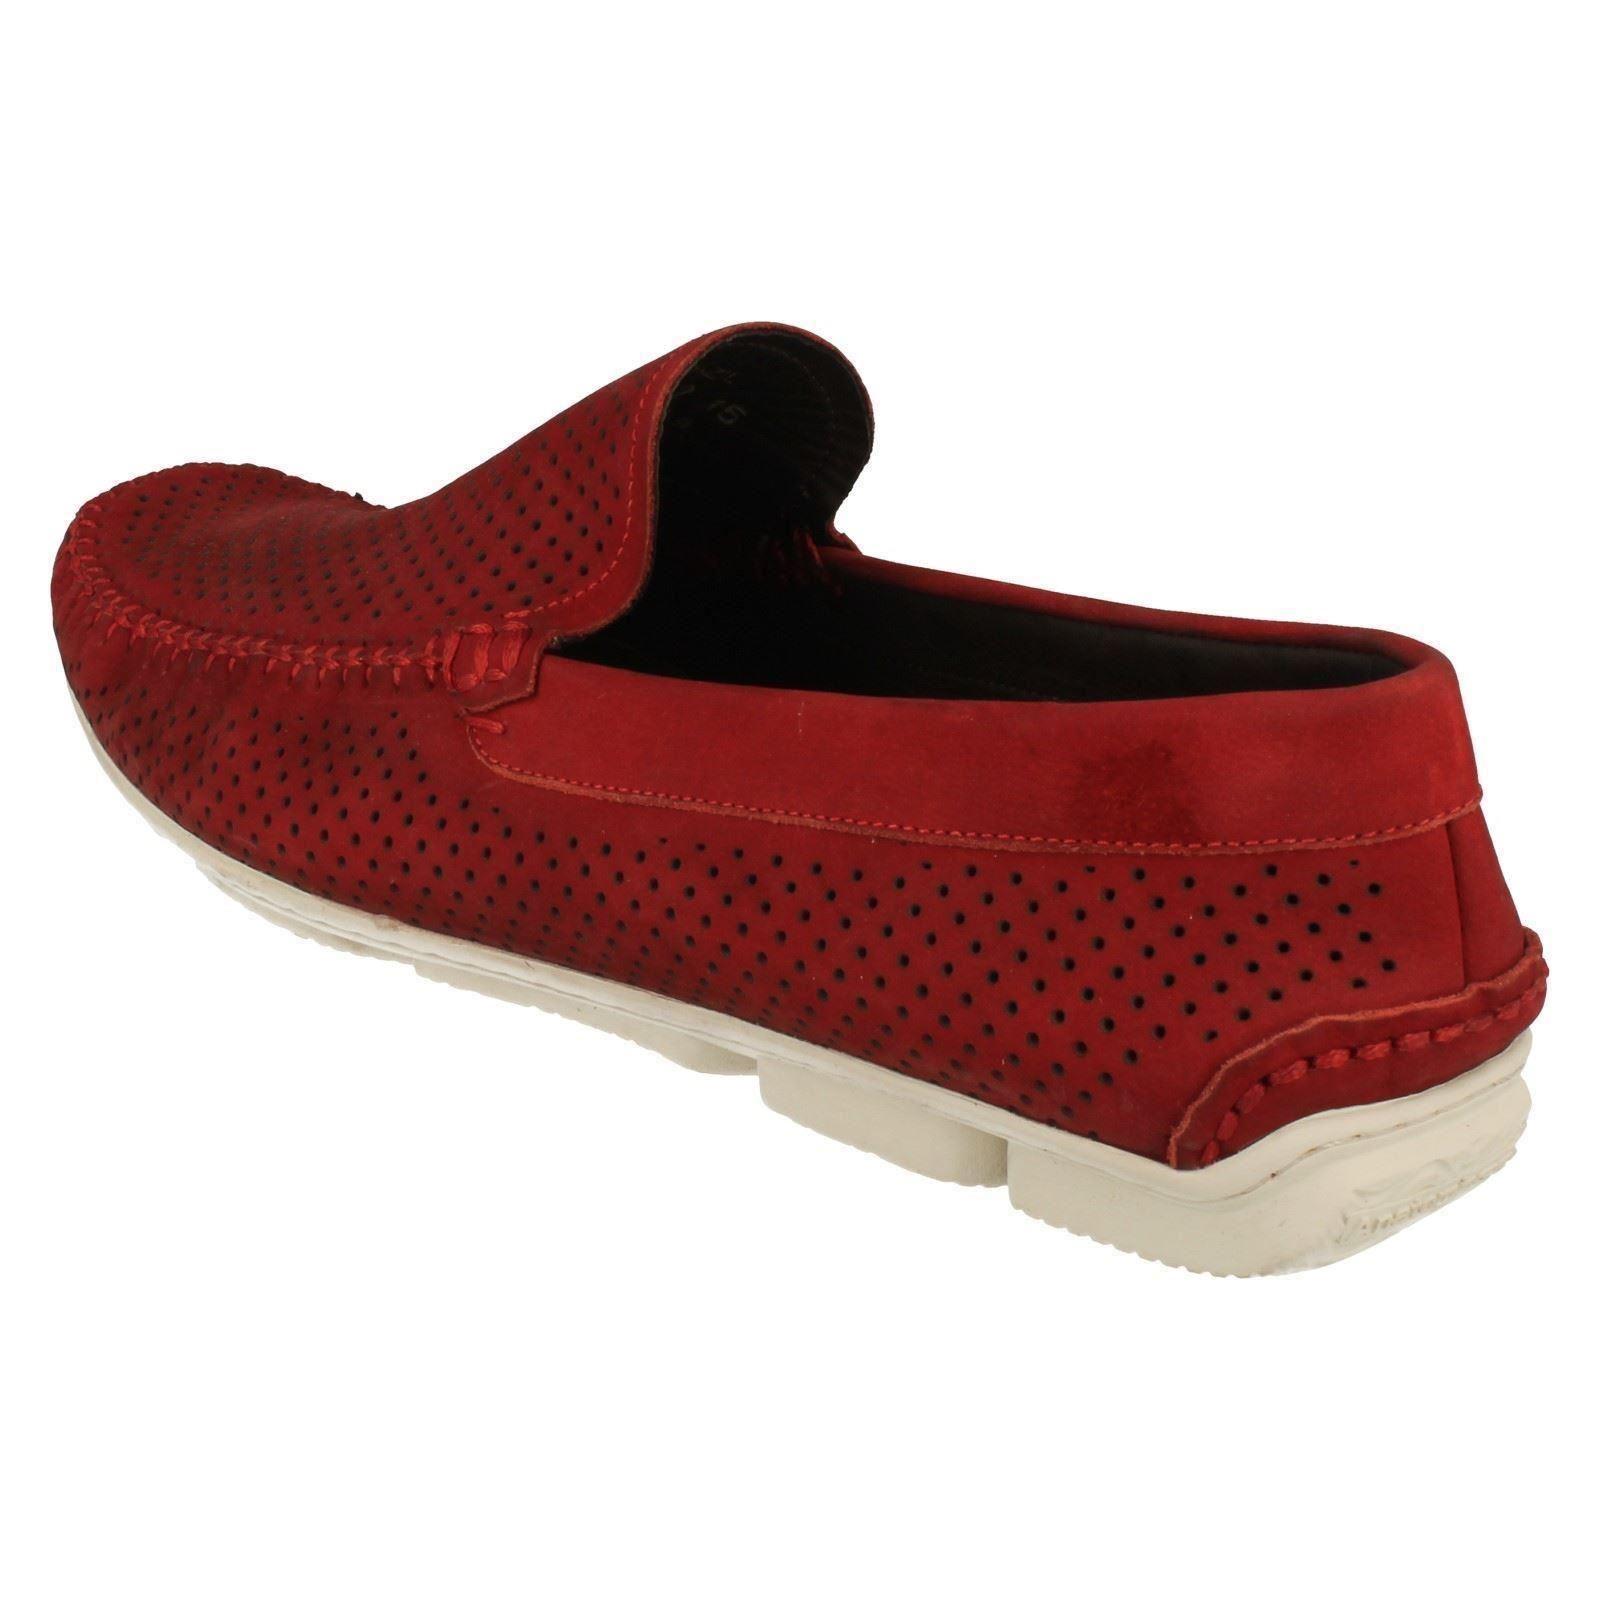 Herren Anatomic Leder Nubuck Schuhes Slip On Schuhes Nubuck Coari 363655 5f36b4